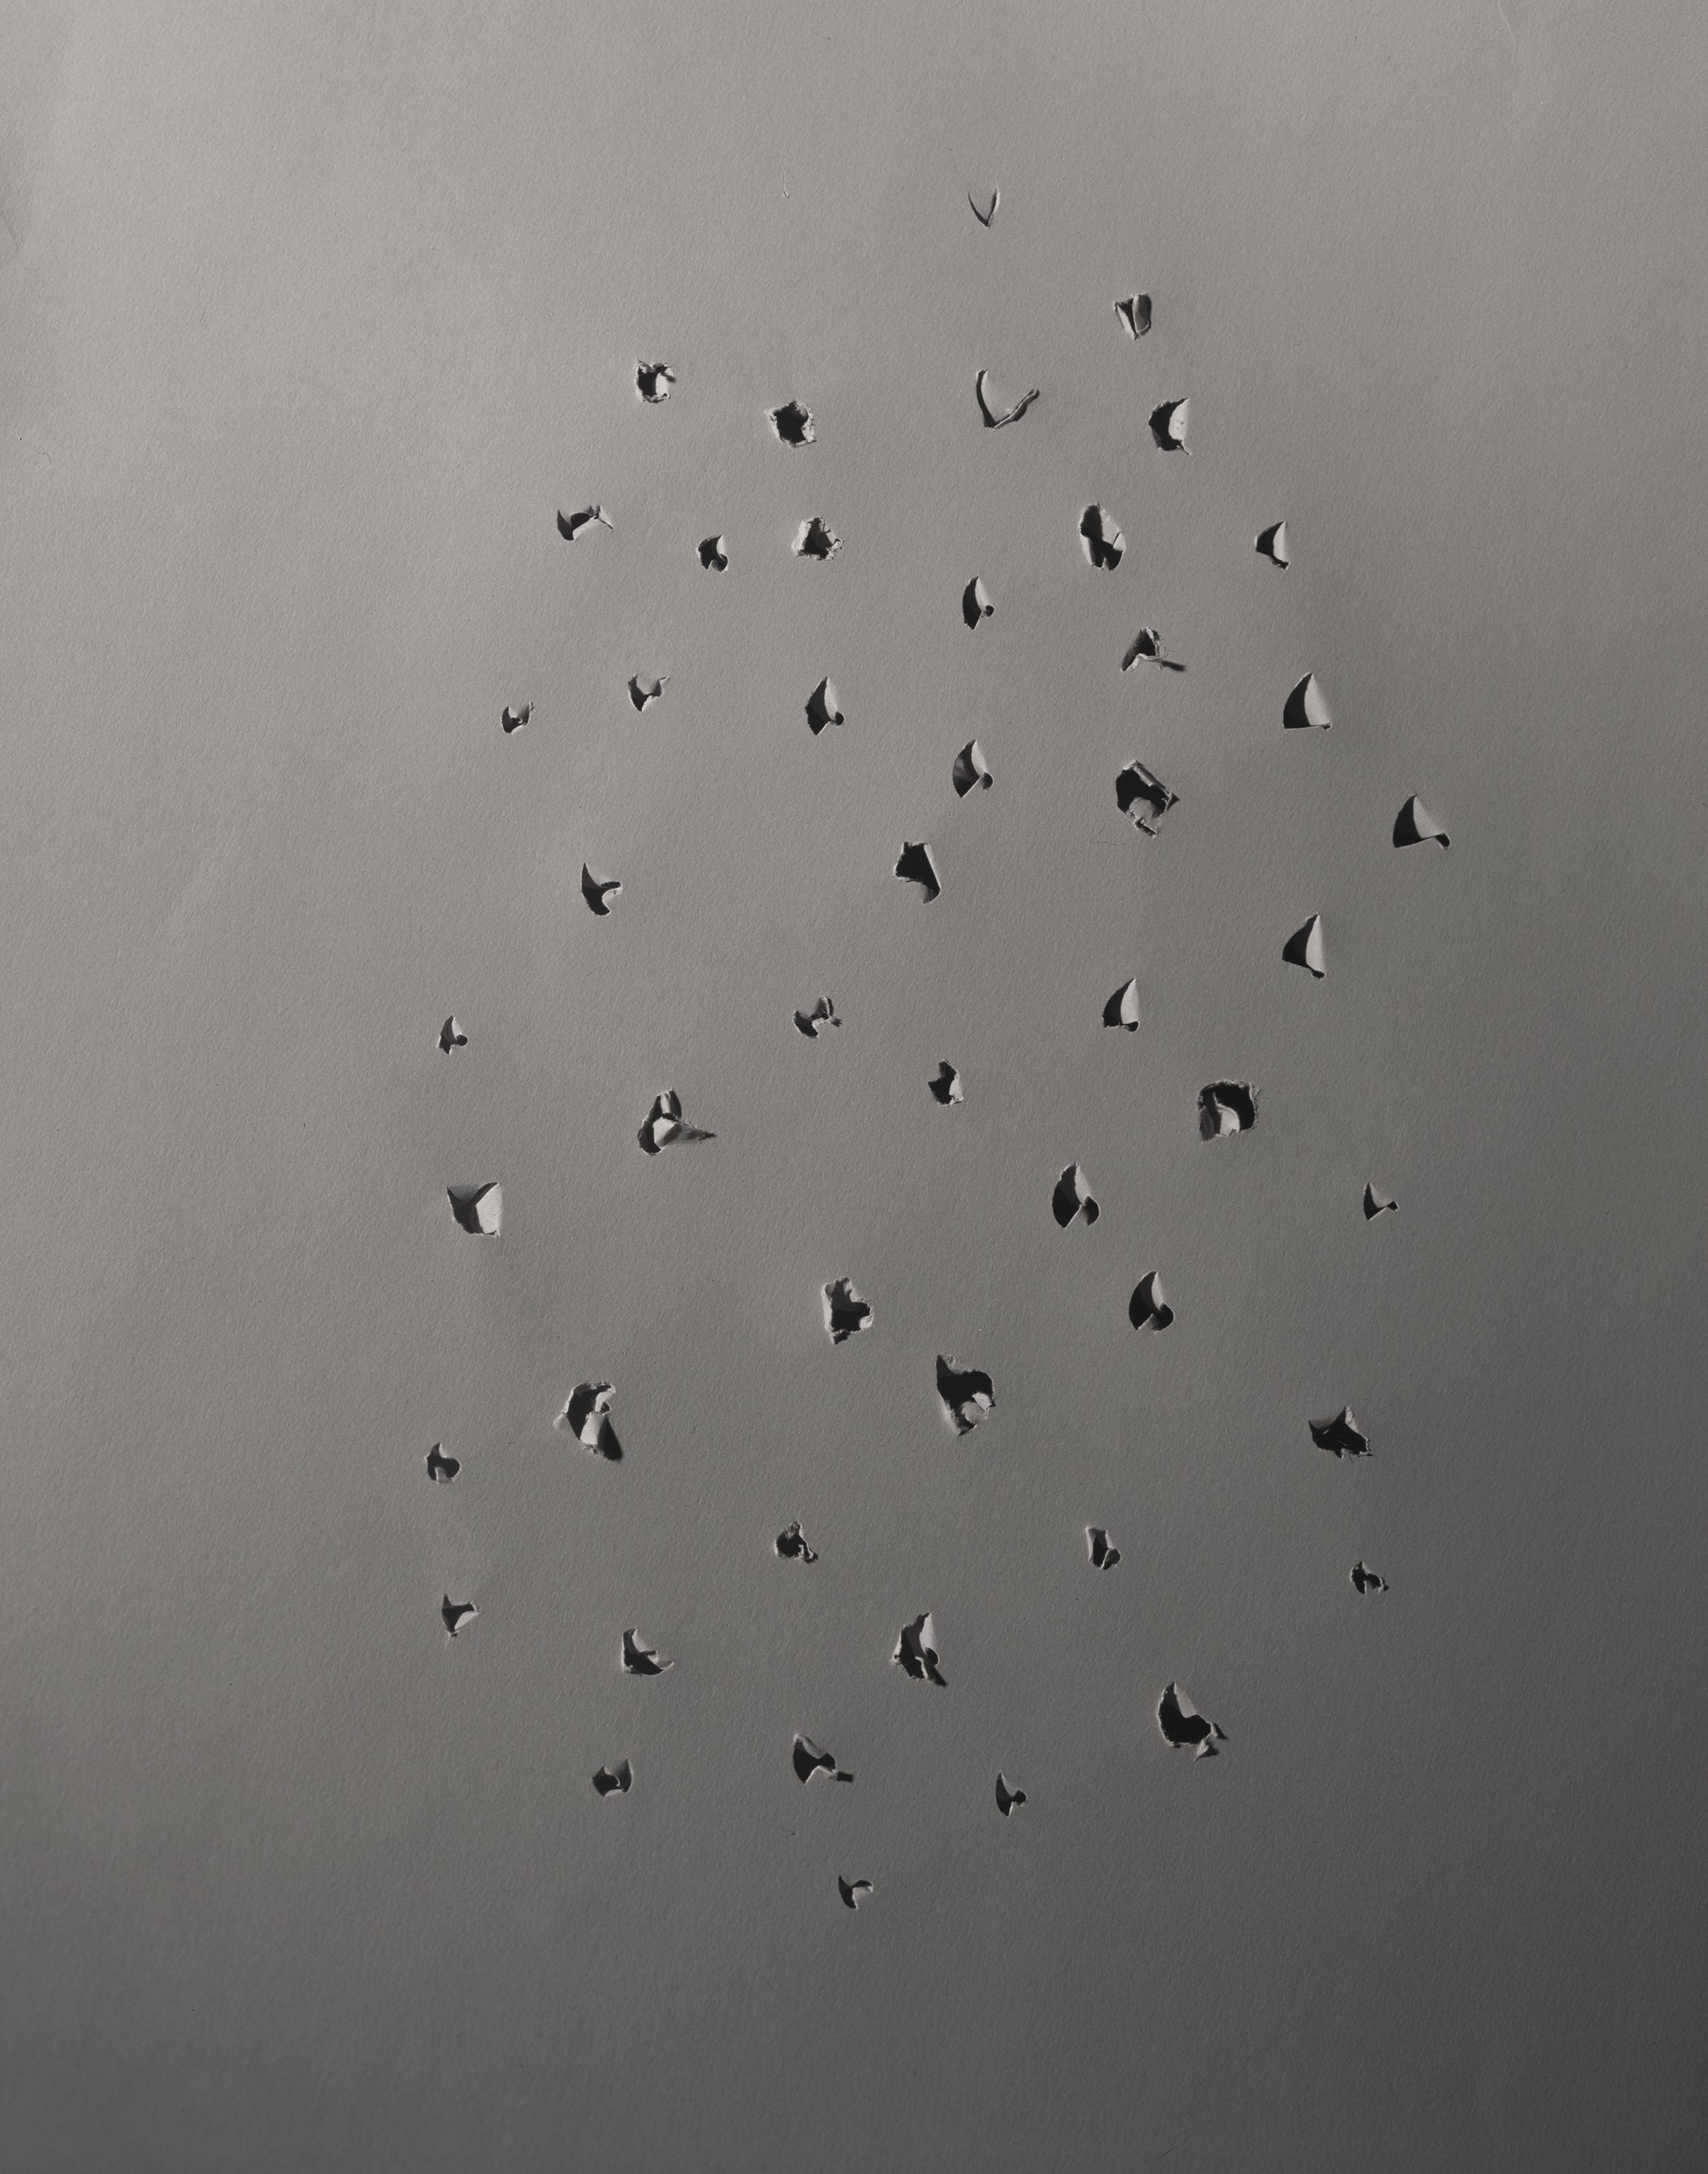 Holes, C-Print, 35 x 27.5 inches, 2014